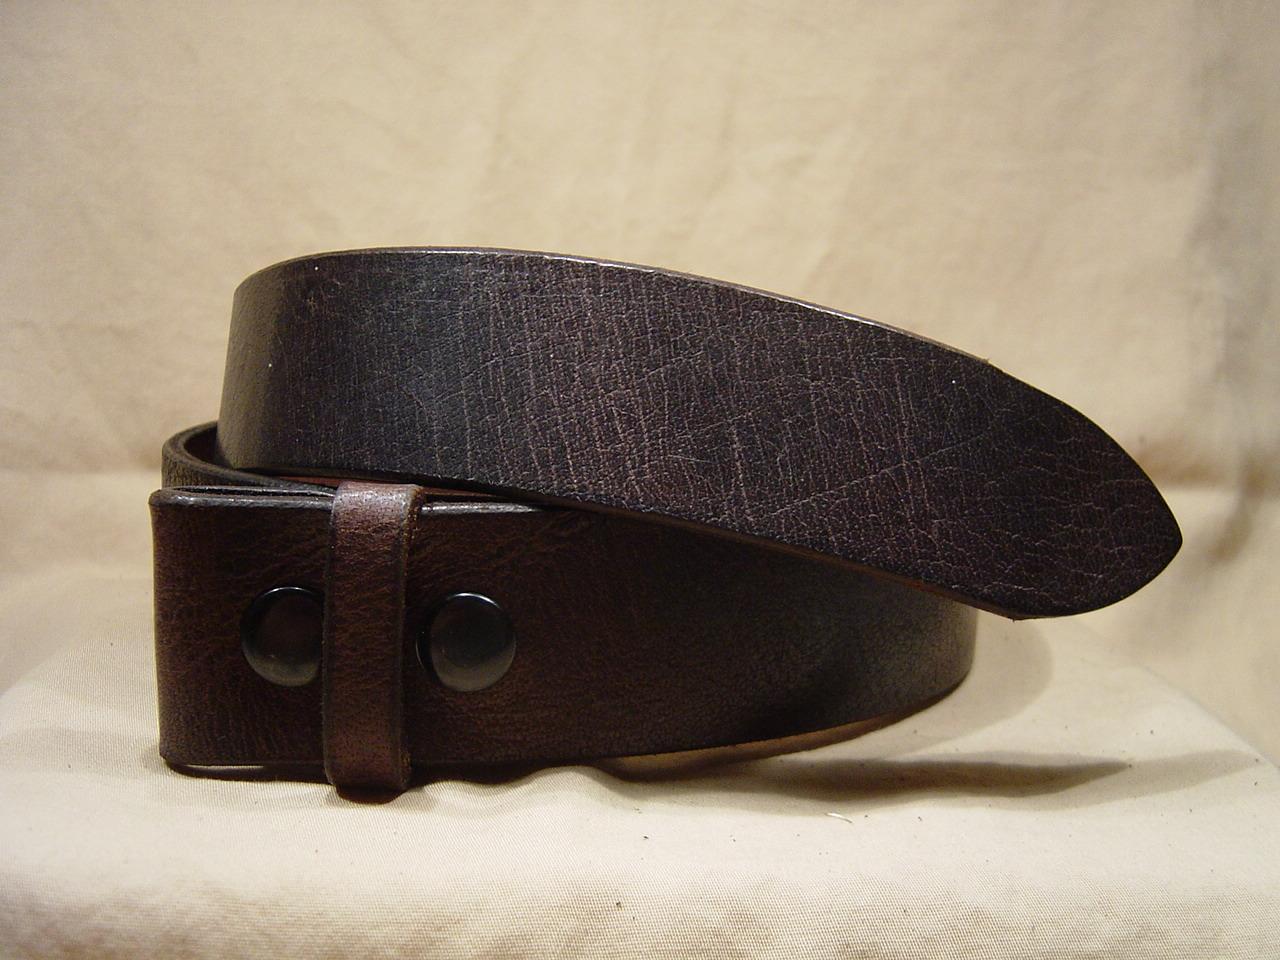 Antique brown leather belt